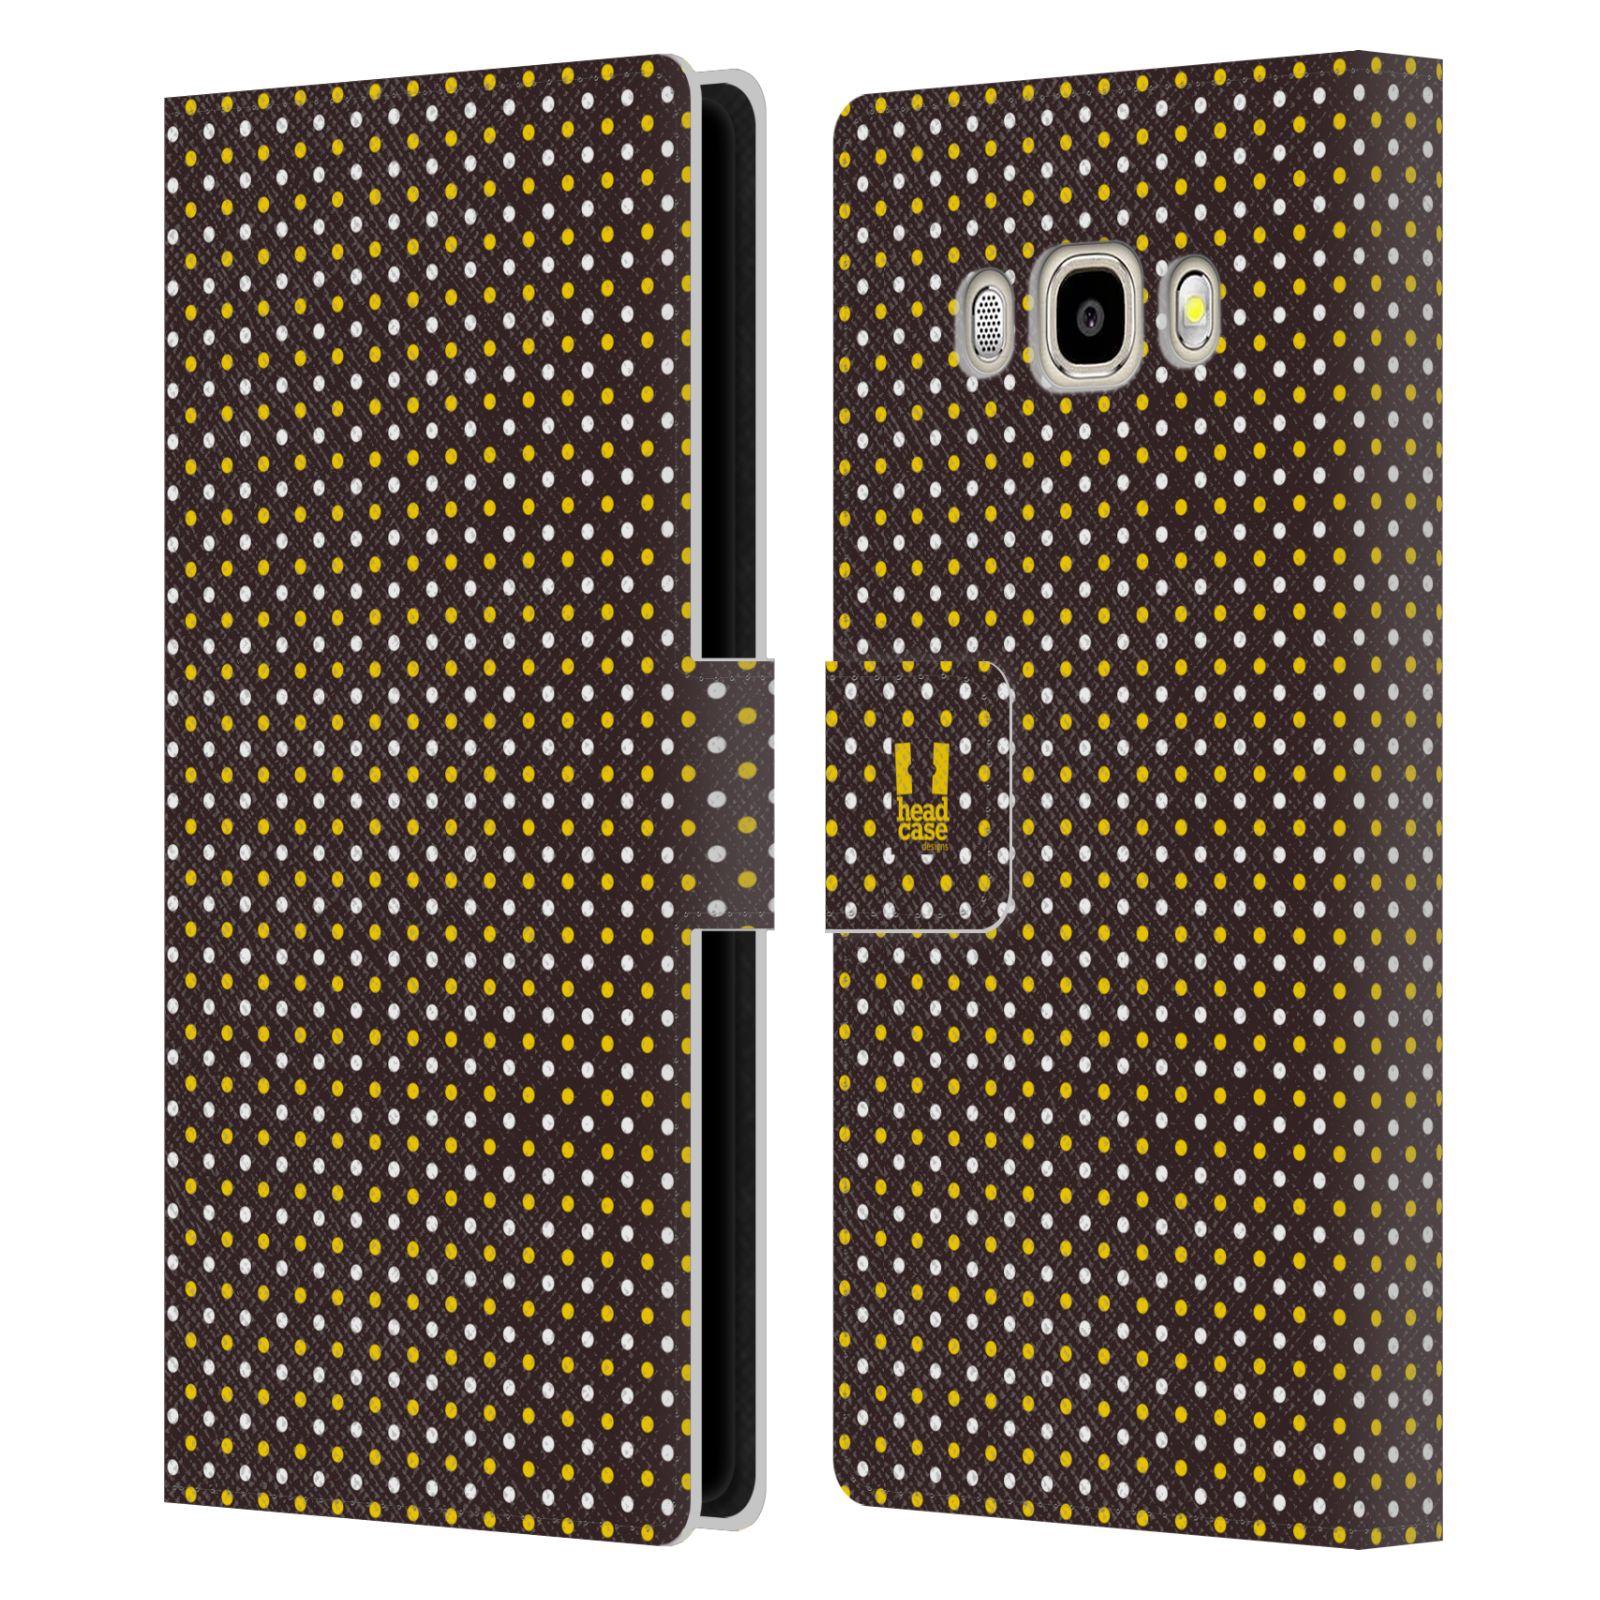 HEAD CASE Flipové pouzdro pro mobil Samsung Galaxy J5 2016 VČELÍ VZOR puntíky hnědá a žlutá